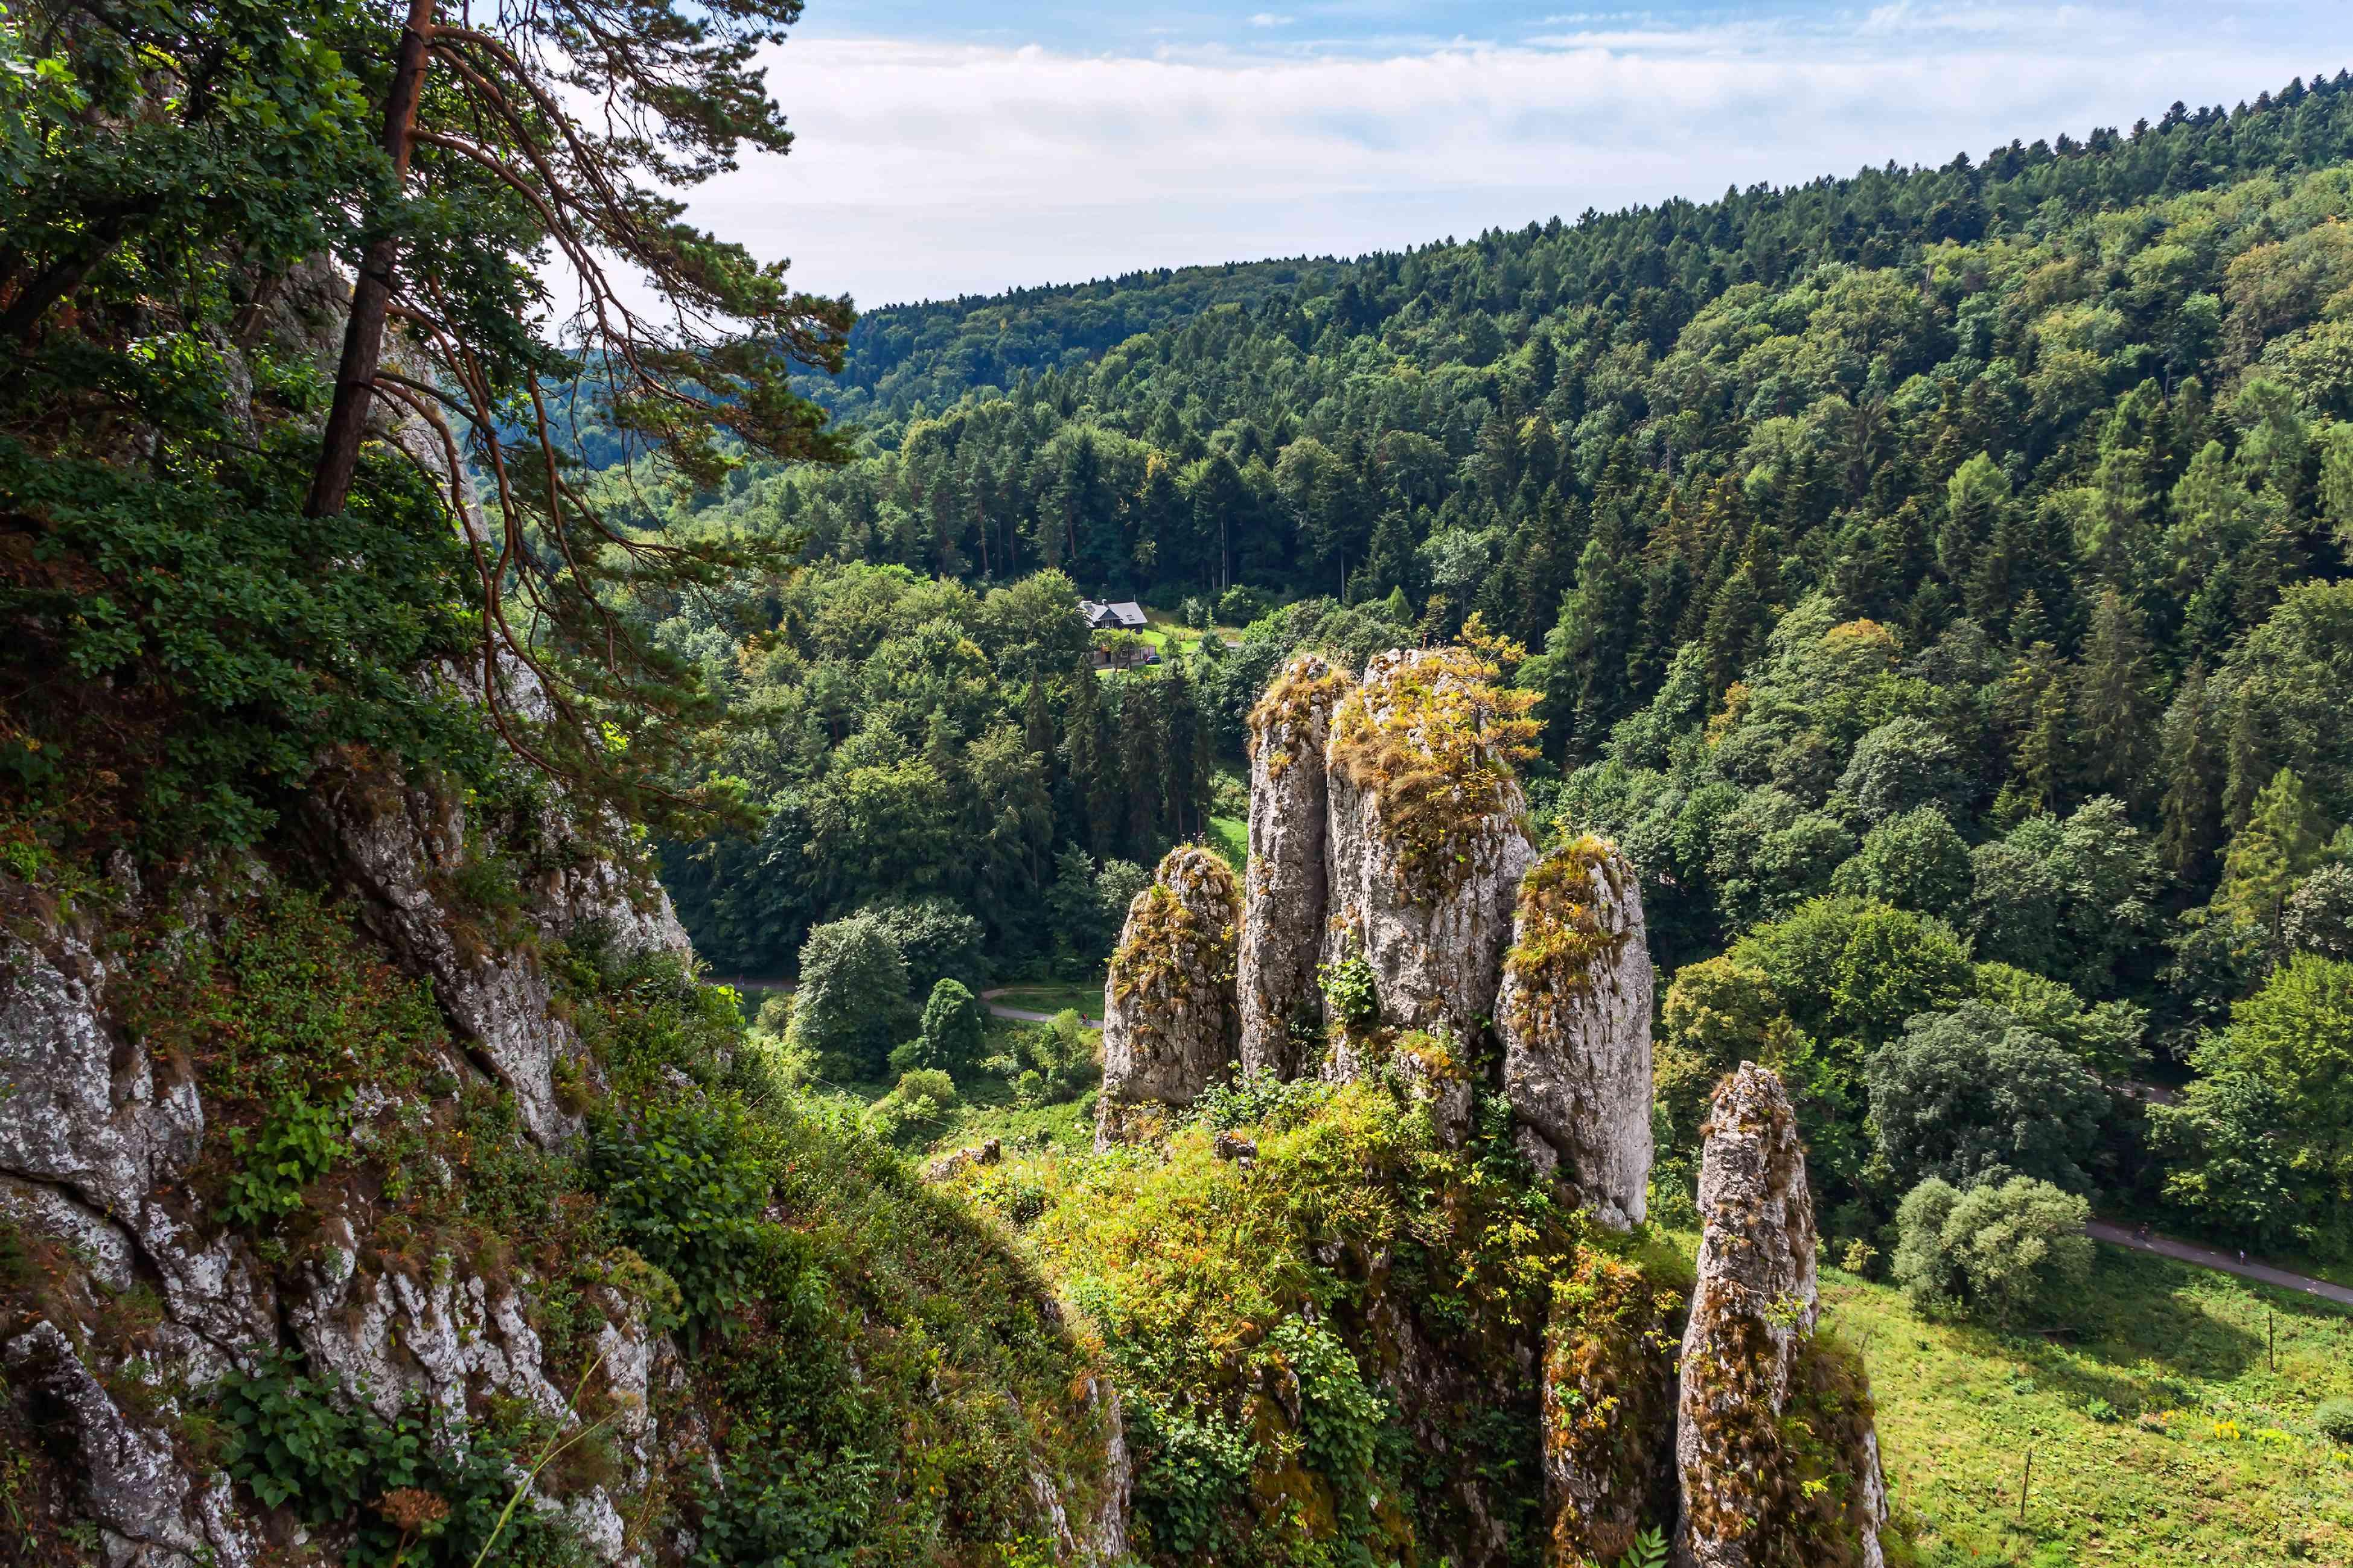 The Glove Rock (Rekawica or Biala Reka) in Ojcow National Park.